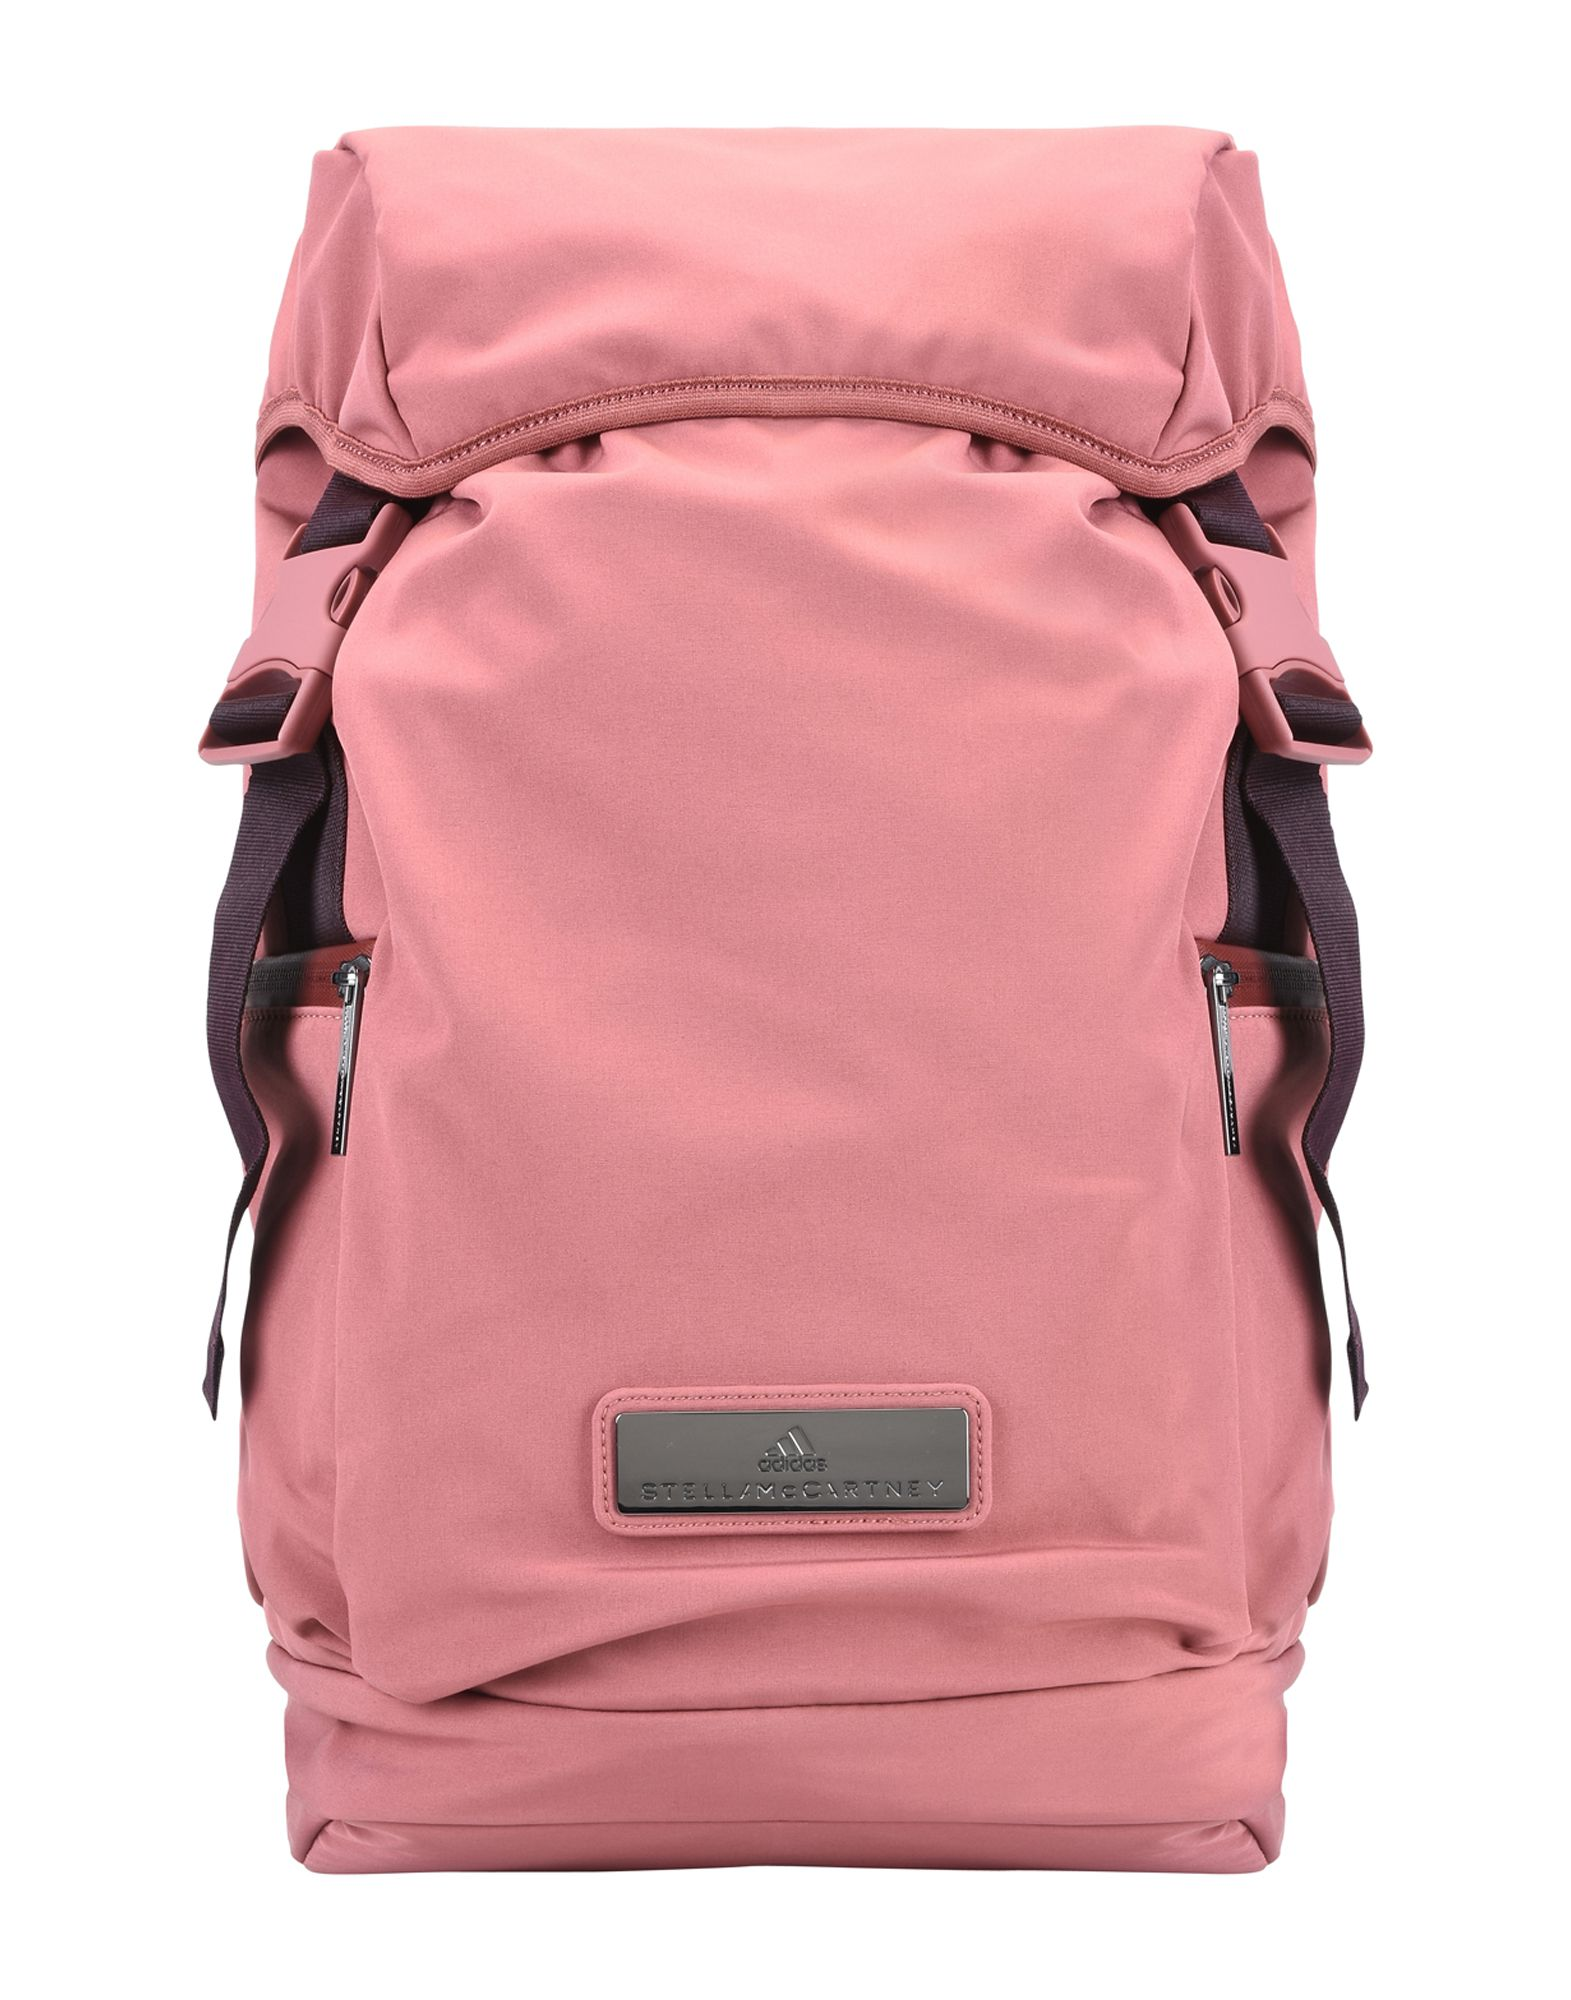 ADIDAS by STELLA McCARTNEY Рюкзаки и сумки на пояс сумка для города adidas d85985 by stella mccartney